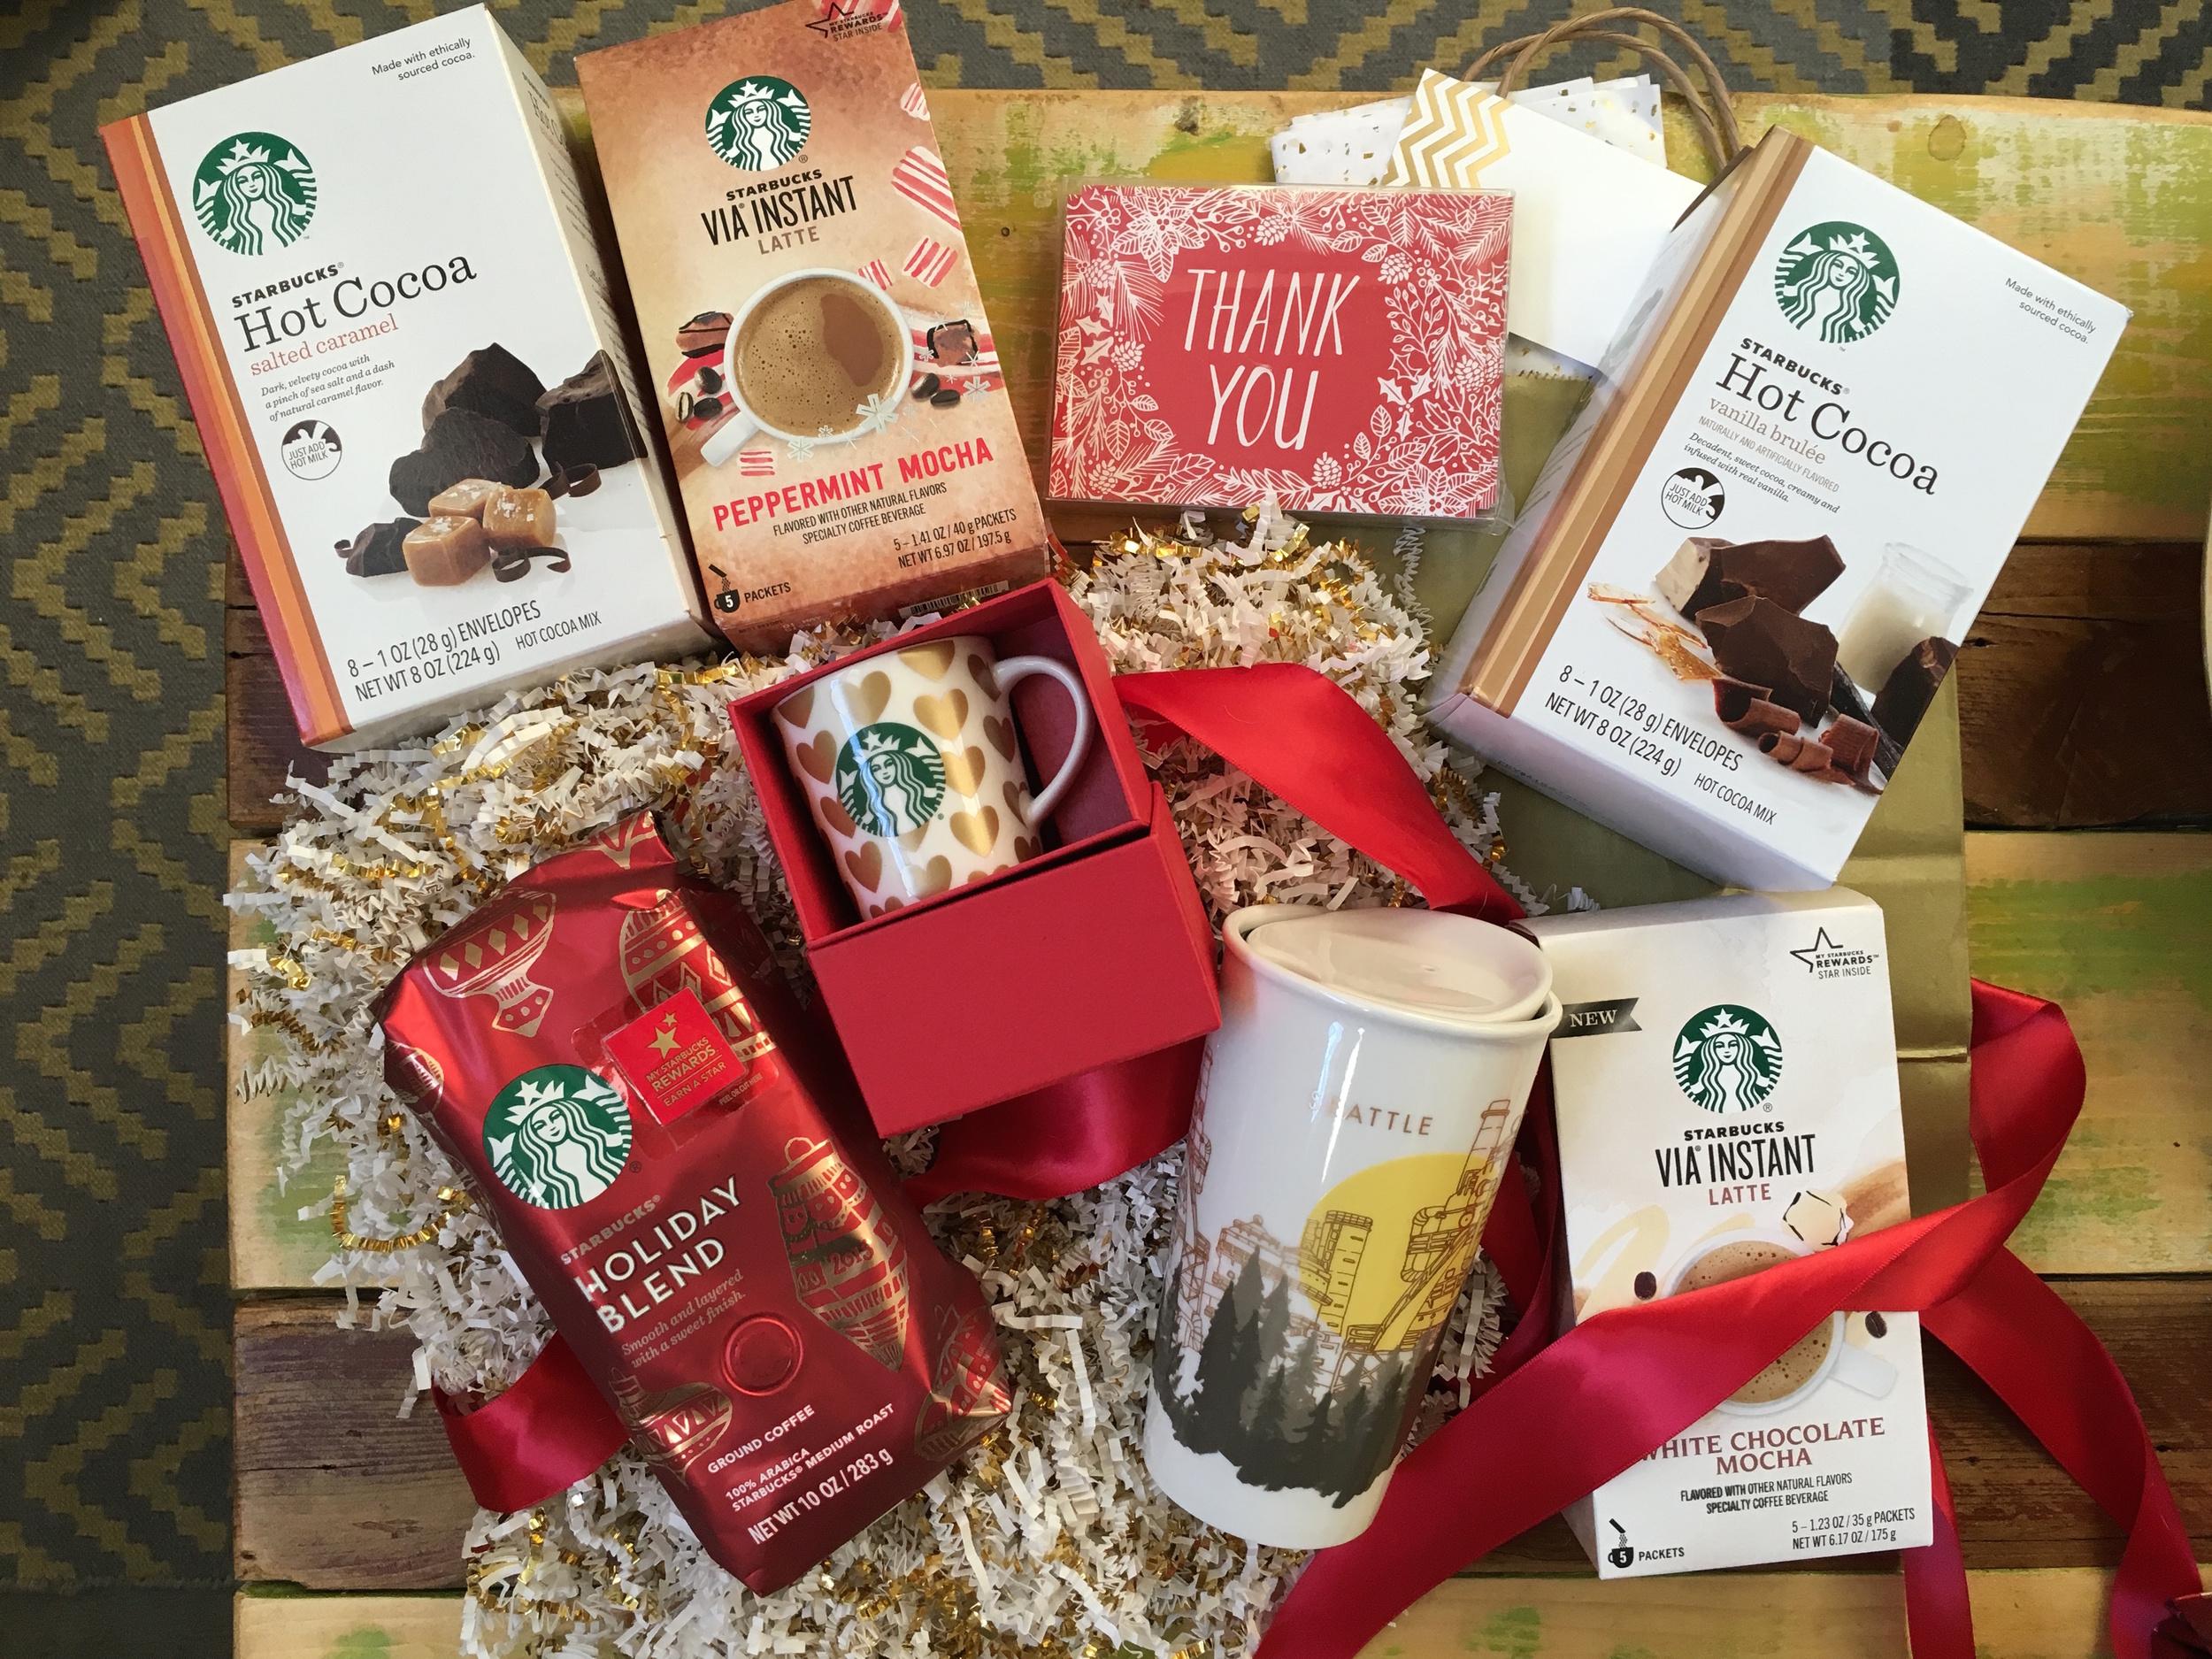 Starbucks Holiday 2015